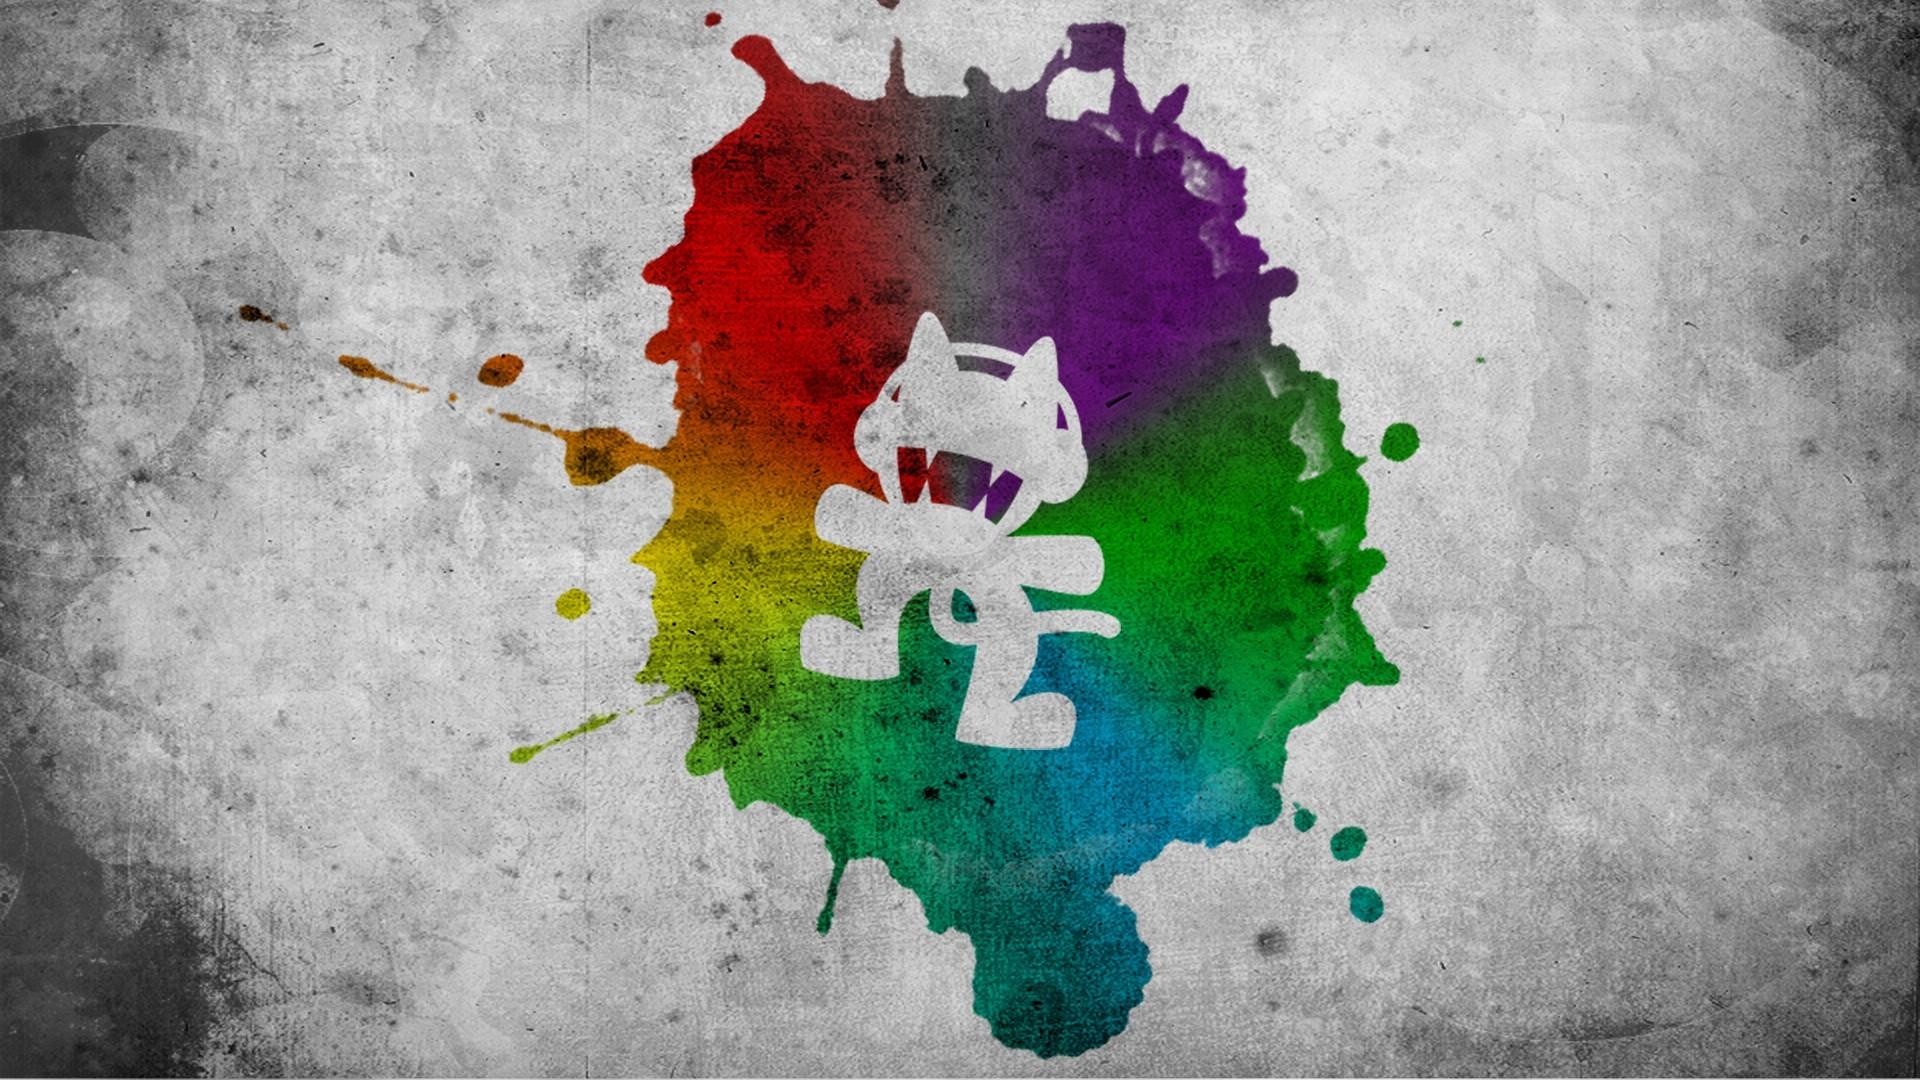 Wallpaper : illustration, green, texture, Monstercat, ART, color ...